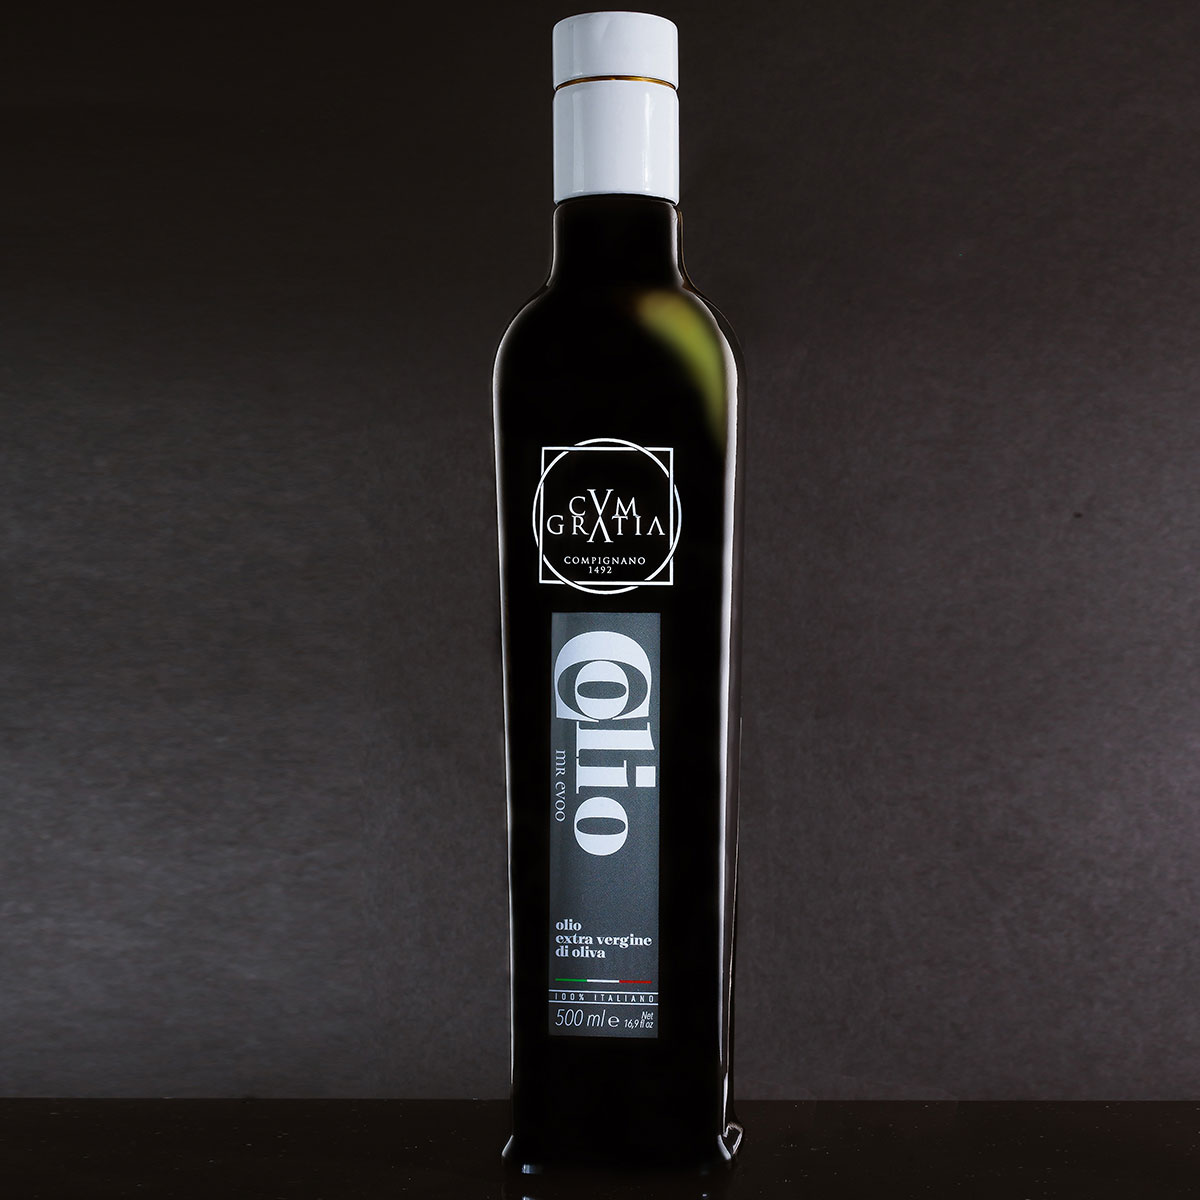 Olio extra vergine di oliva umbro COLIO® Mr EVOO ml 500 [BOX 6 bottiglie]